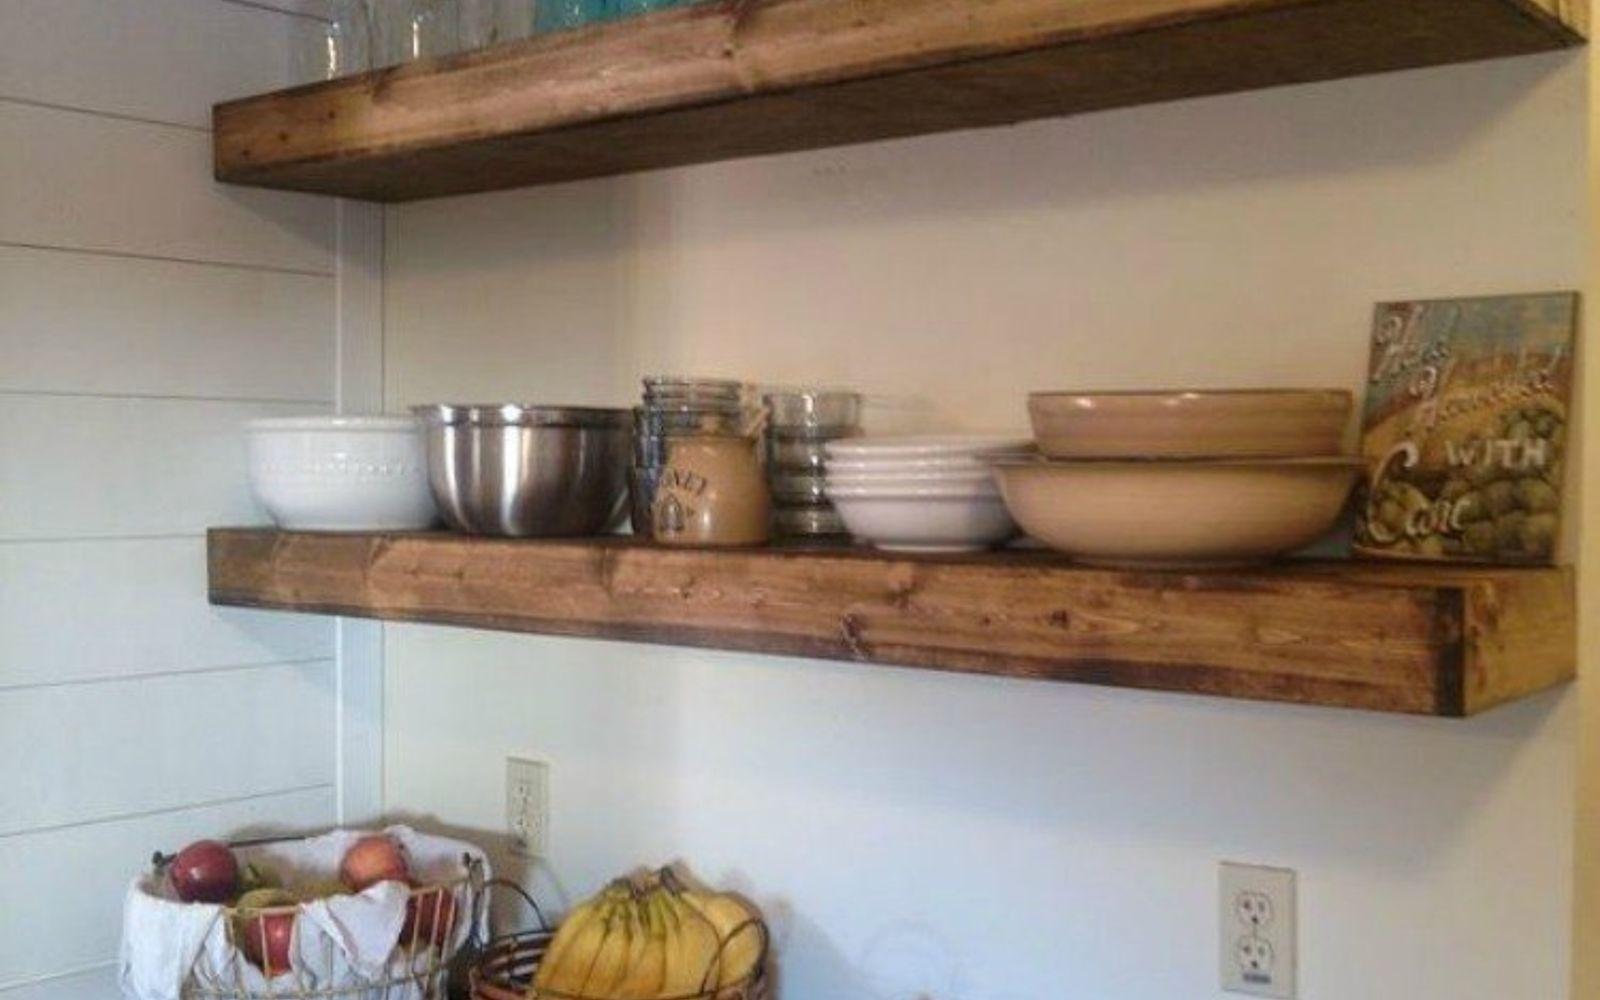 Space Saving Kitchen Ideas 12 space saving hacks for your tight kitchen | hometalk